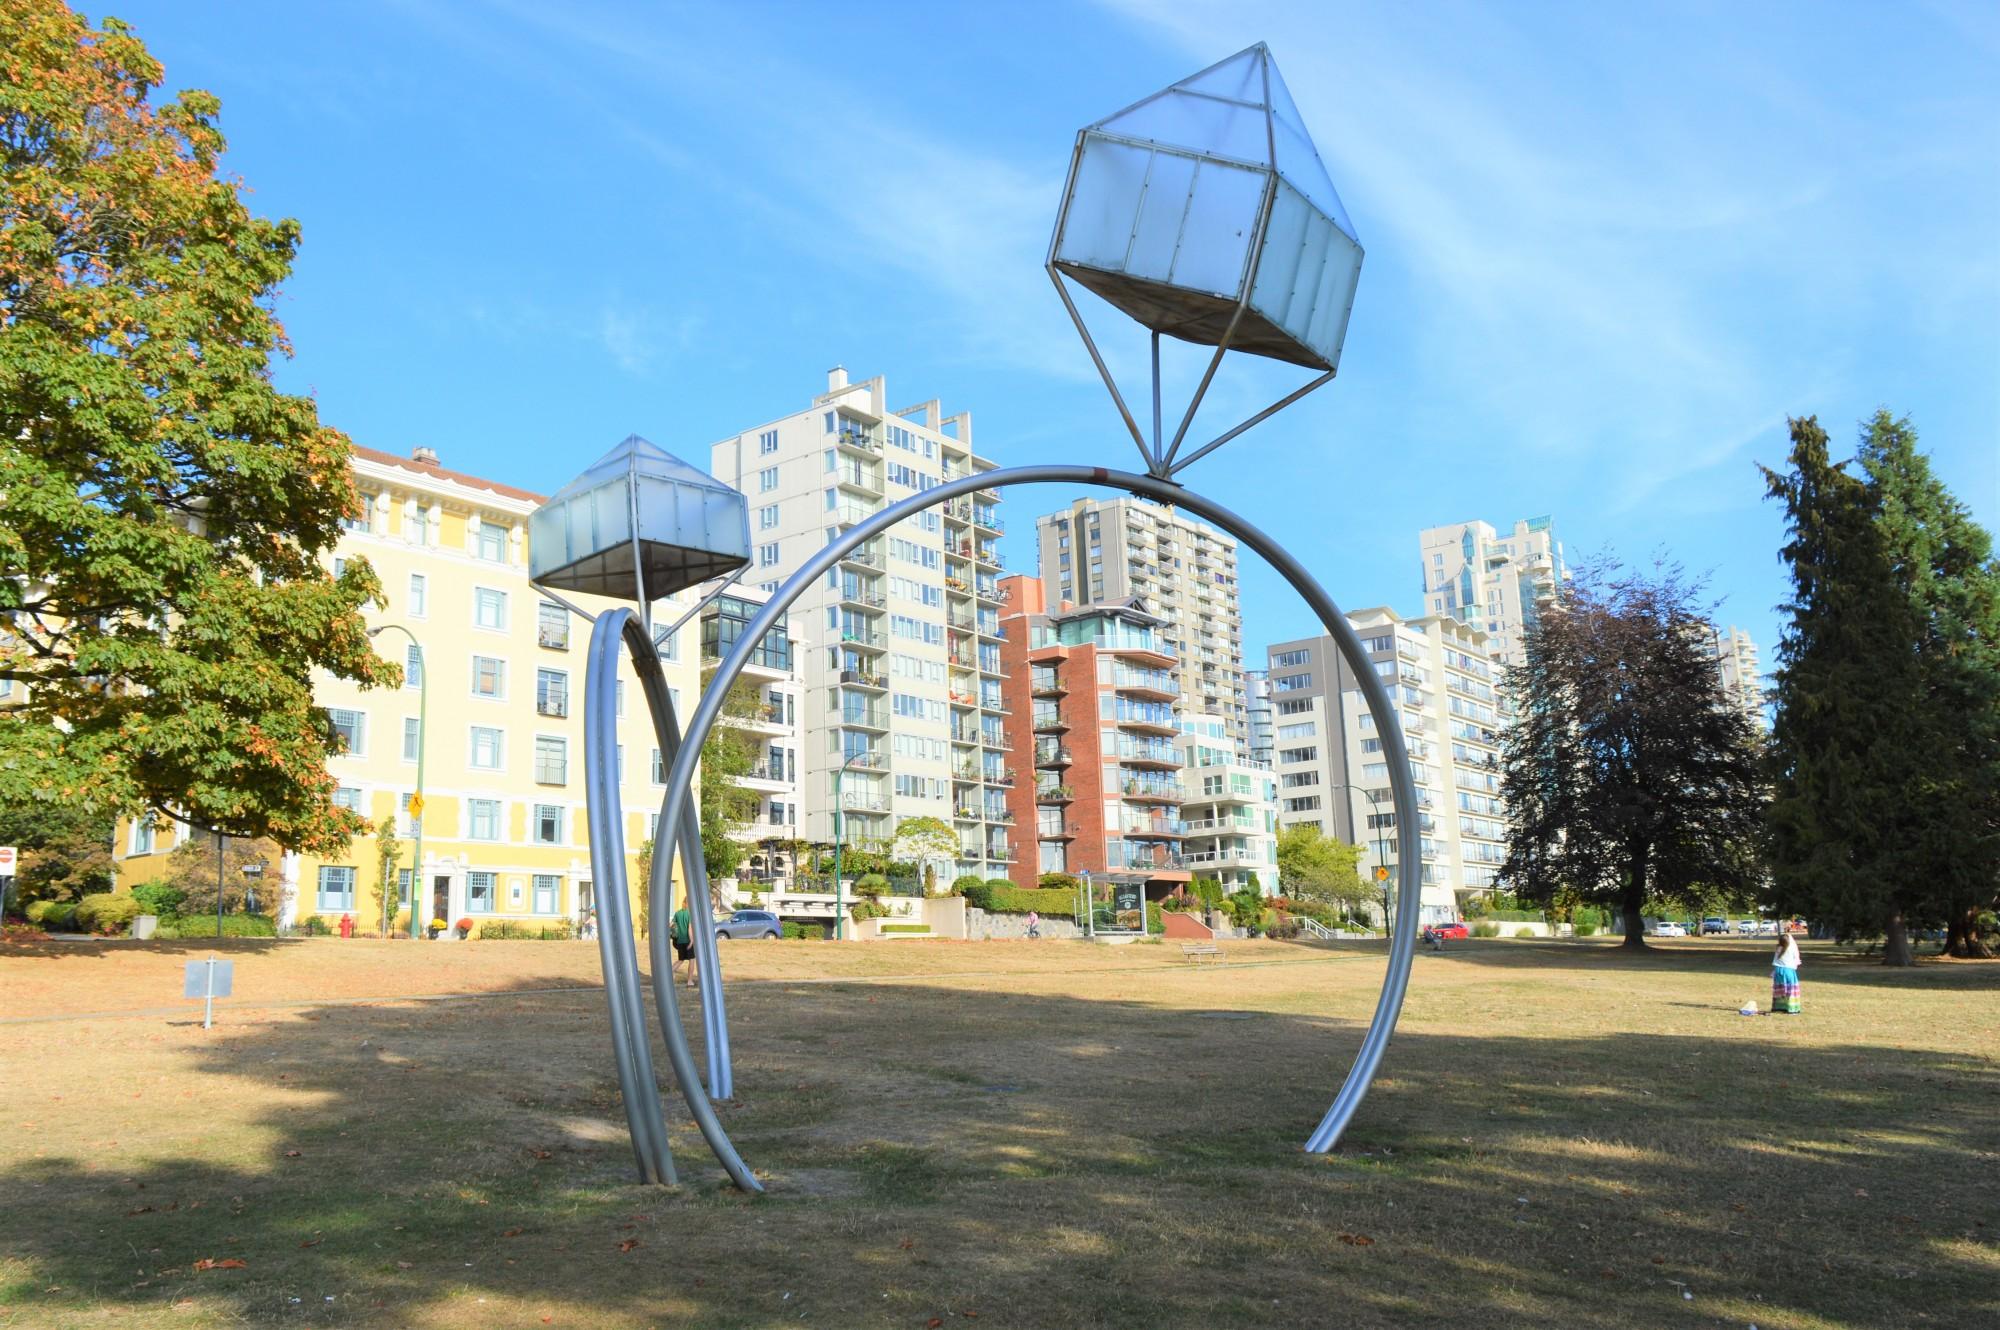 Diamond Rings Public art in Vancouver